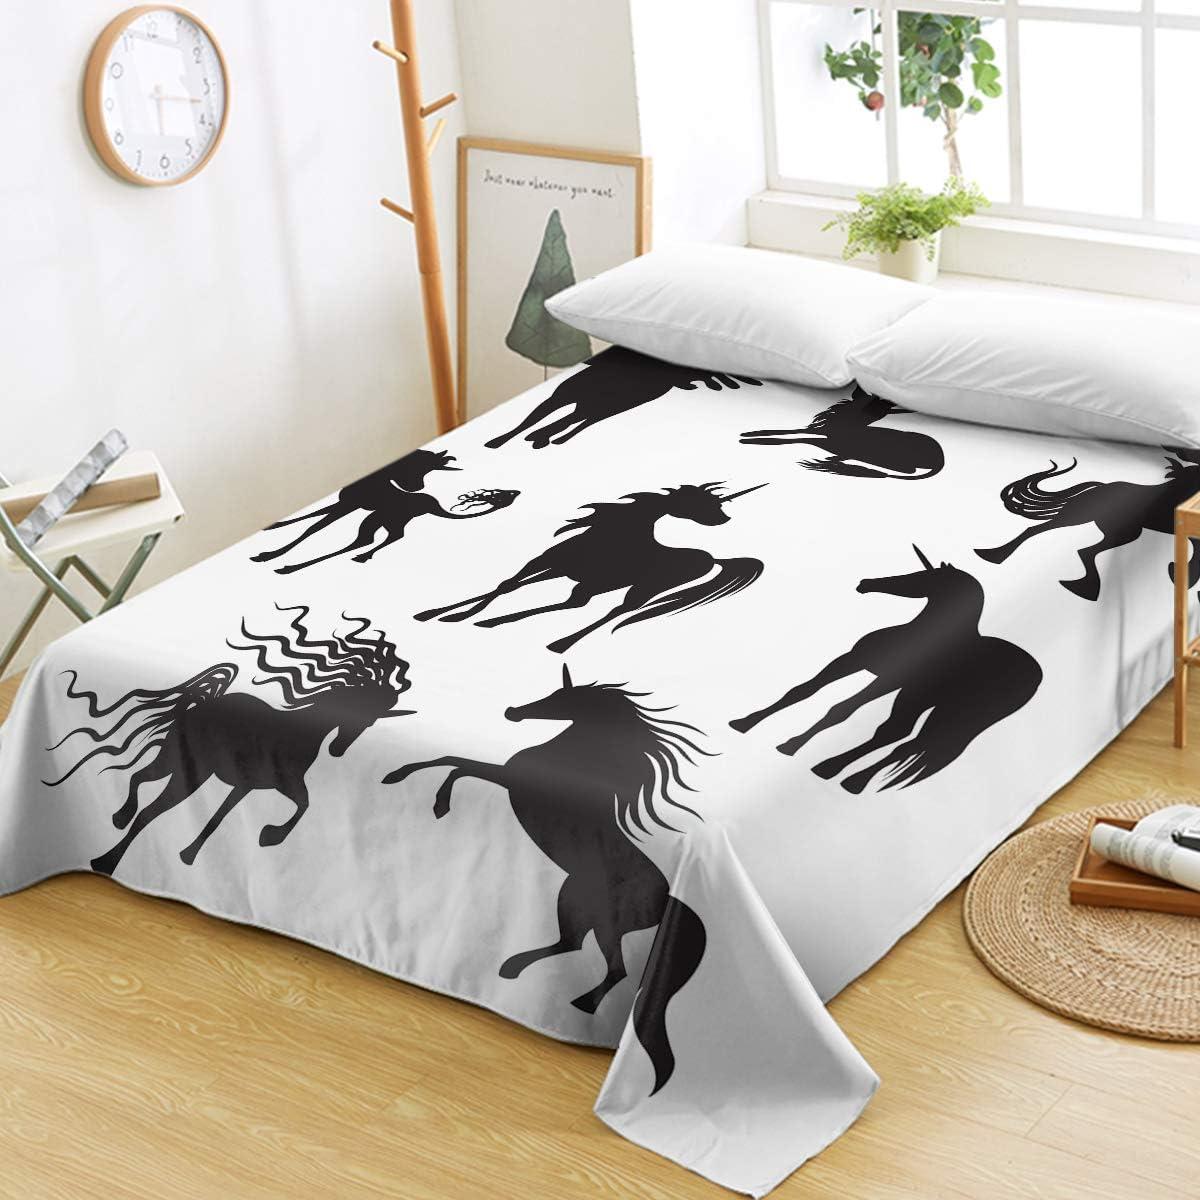 Sleepwish Cartoon Unicorn Super special price Weekly update Flat Sheet Dreamy Printed Animal Cute